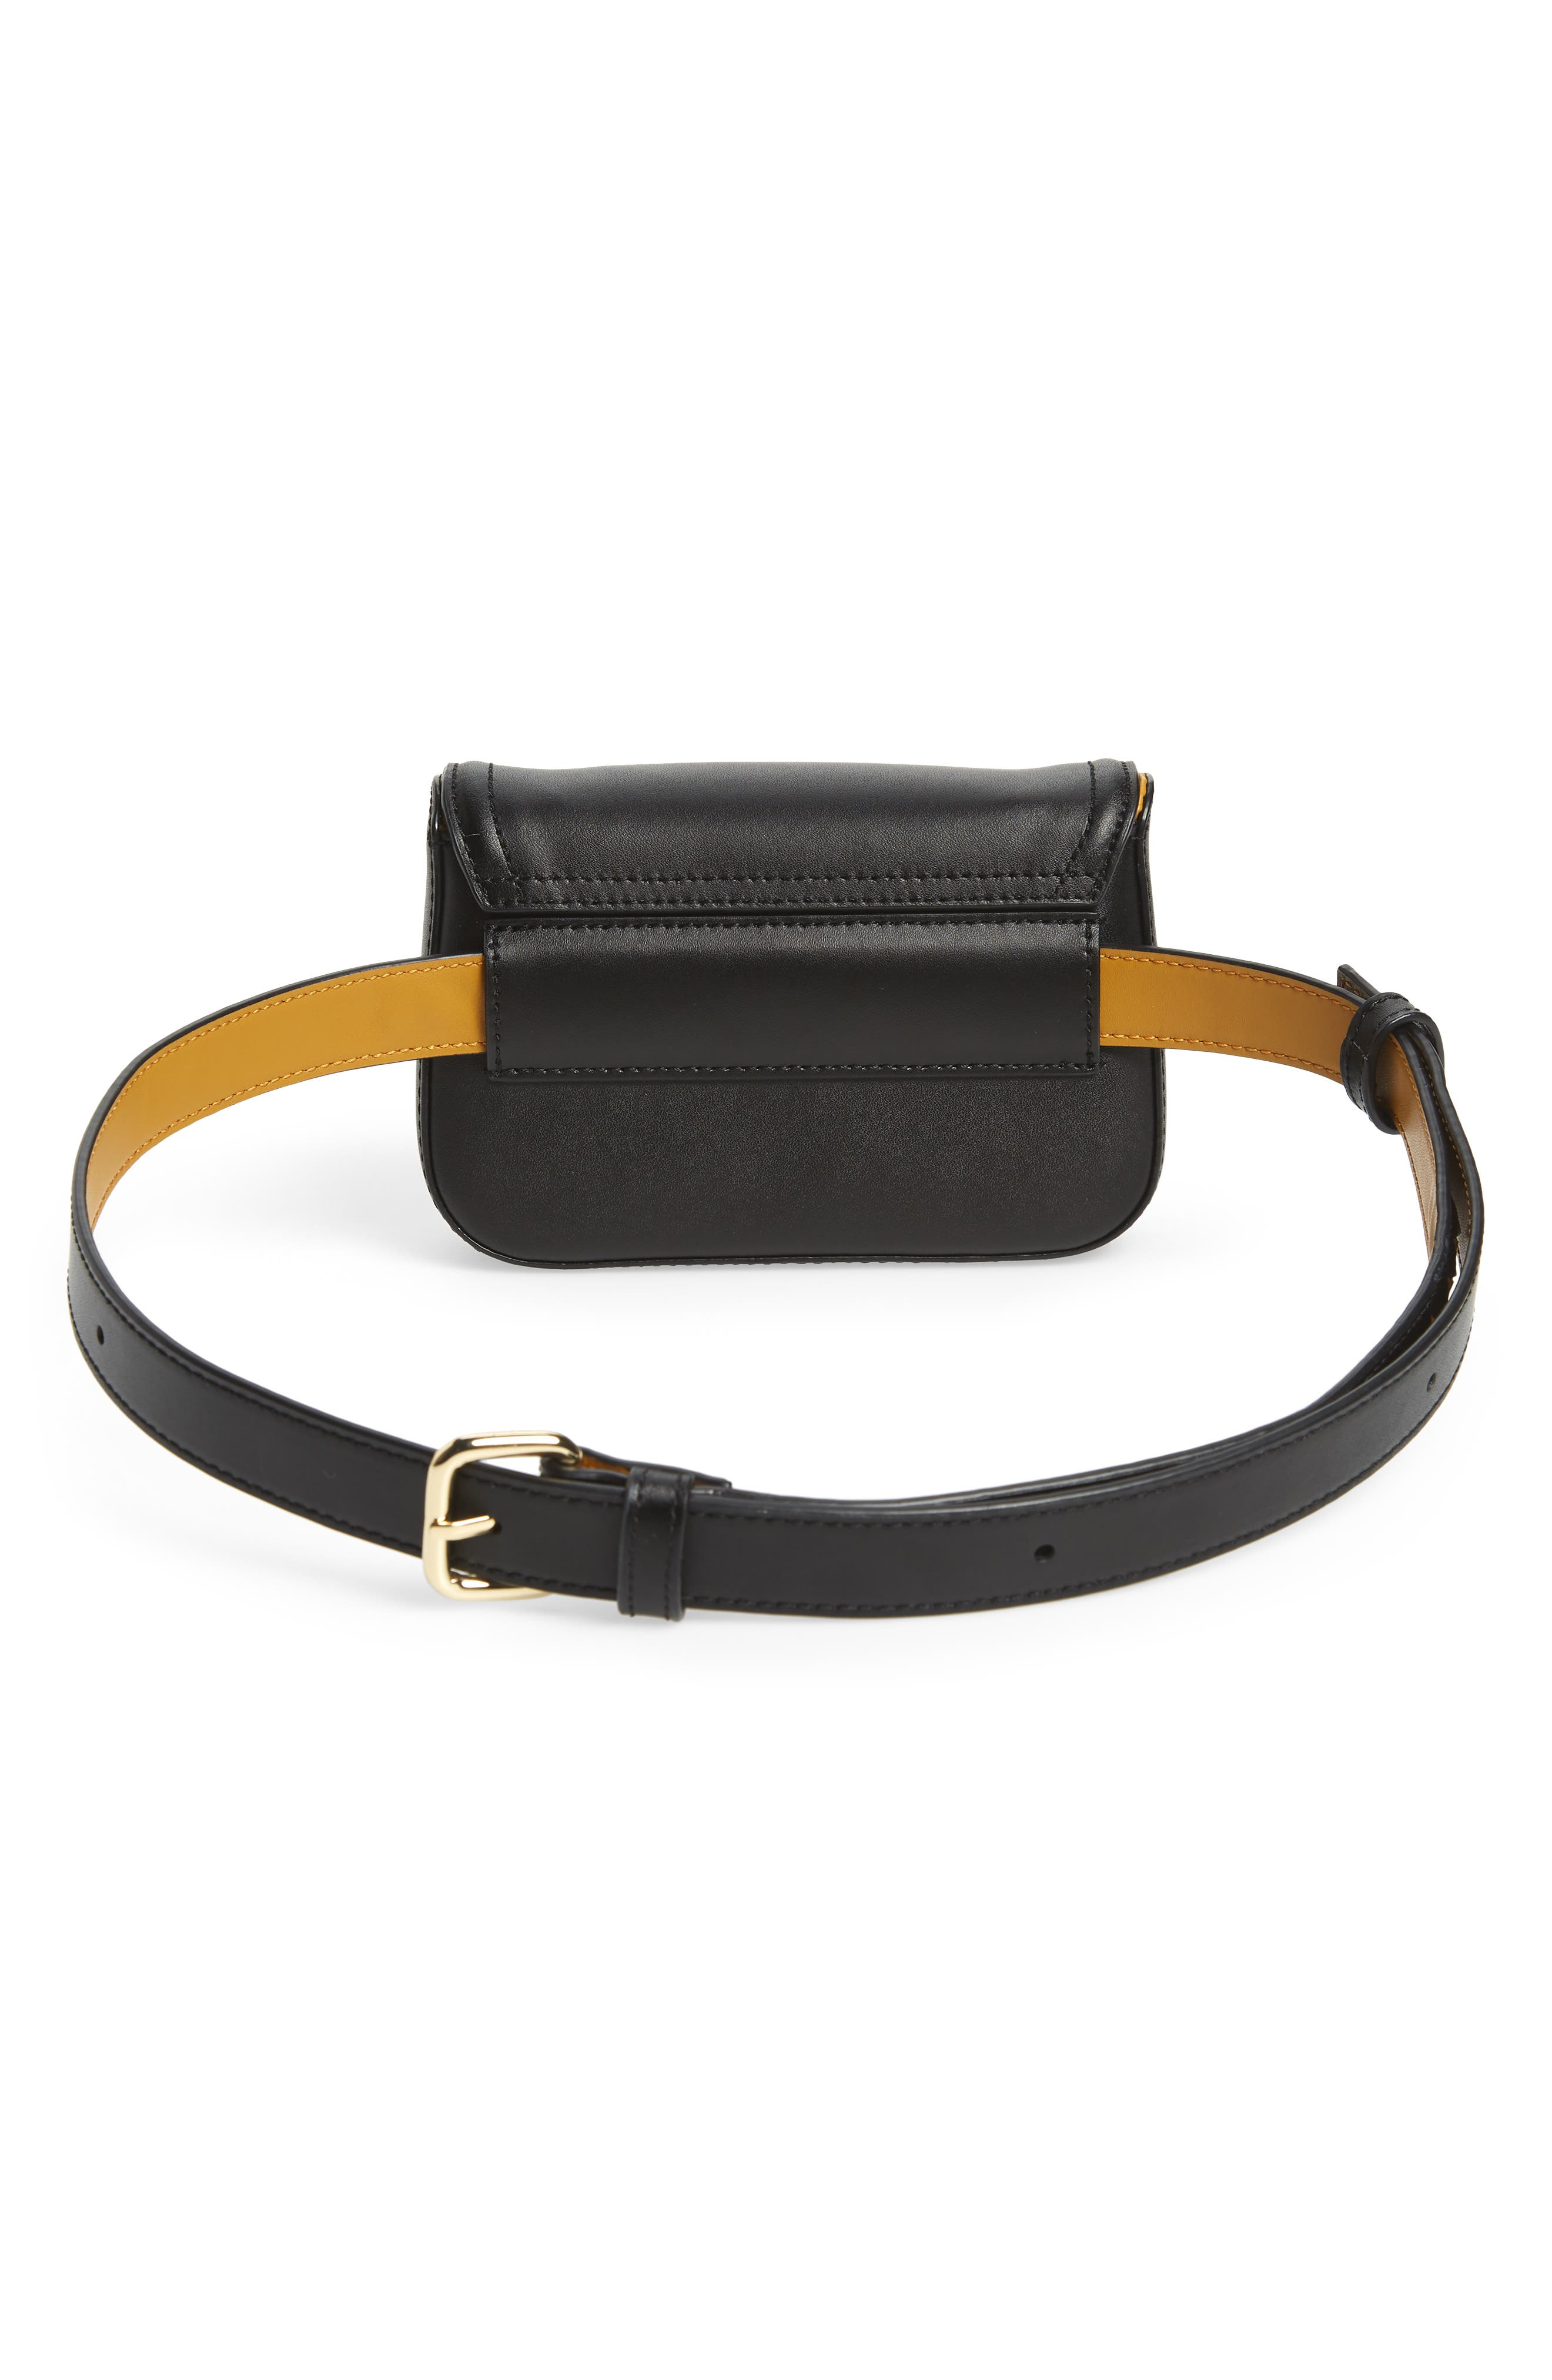 TED BAKER LONDON,                             Colour by Numbers Krakan Leather Belt Bag,                             Alternate thumbnail 5, color,                             BLACK